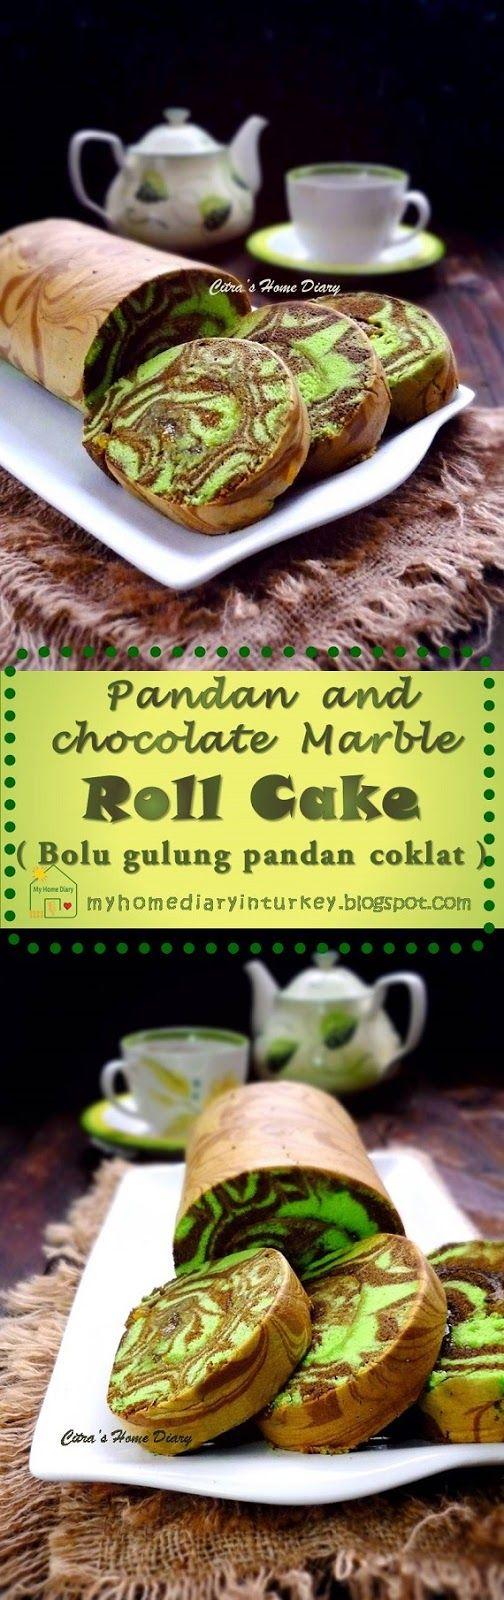 Pandan Chocolate Marble Swiss Roll Cake / Bolu gulung marble pandan coklat. #Rollcake #swissrollcake #pandan #bolugulungmarmer #marblerollcake #marblecake